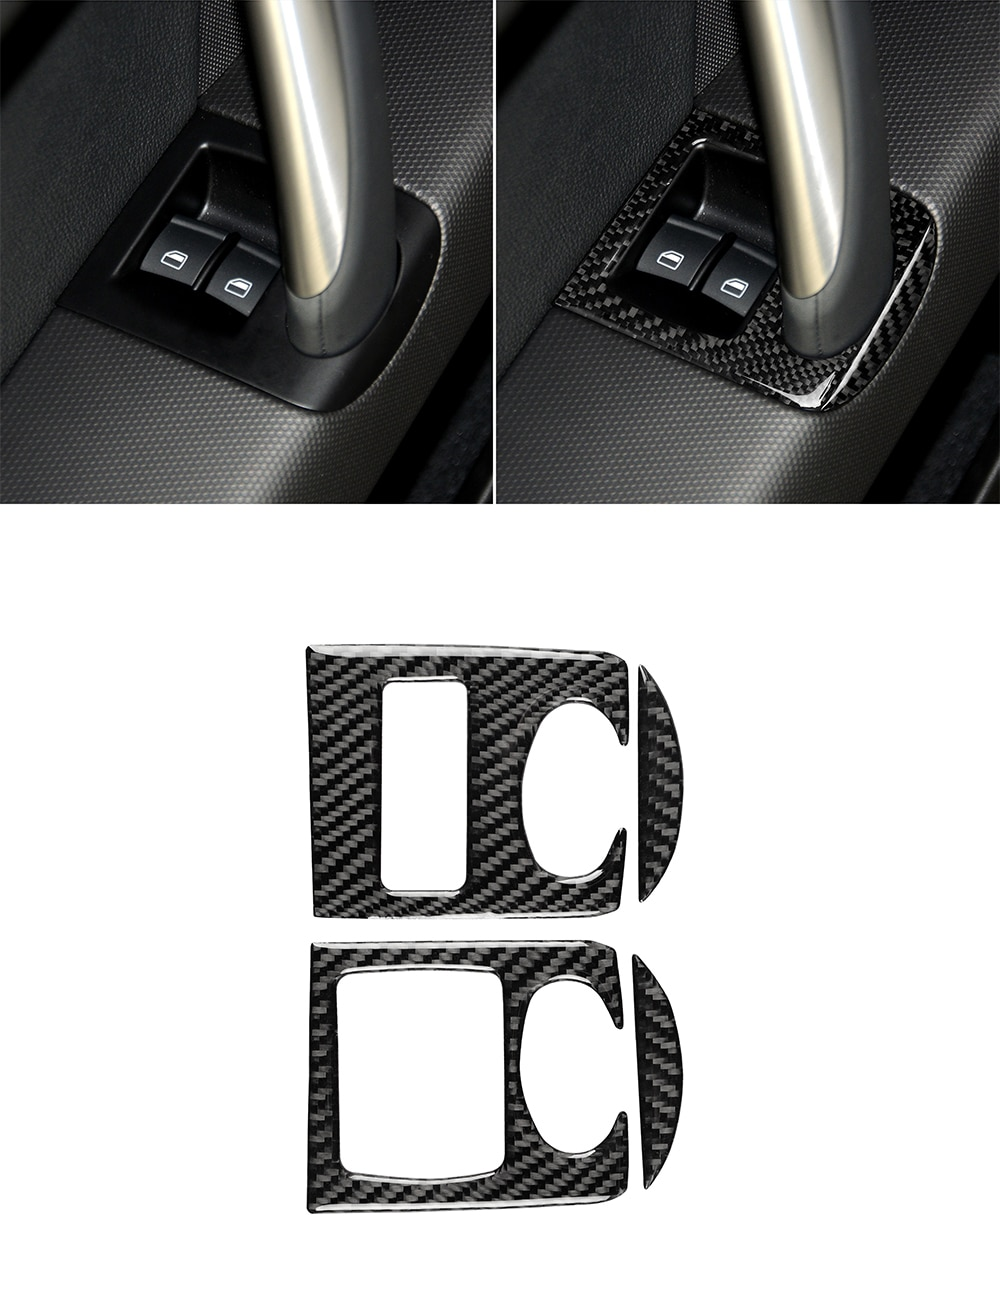 Carbon fiber Car Window Lifter Button Panel Decorative Cover for 2008-2014 Audi TT 8n 8J MK123 TTRS